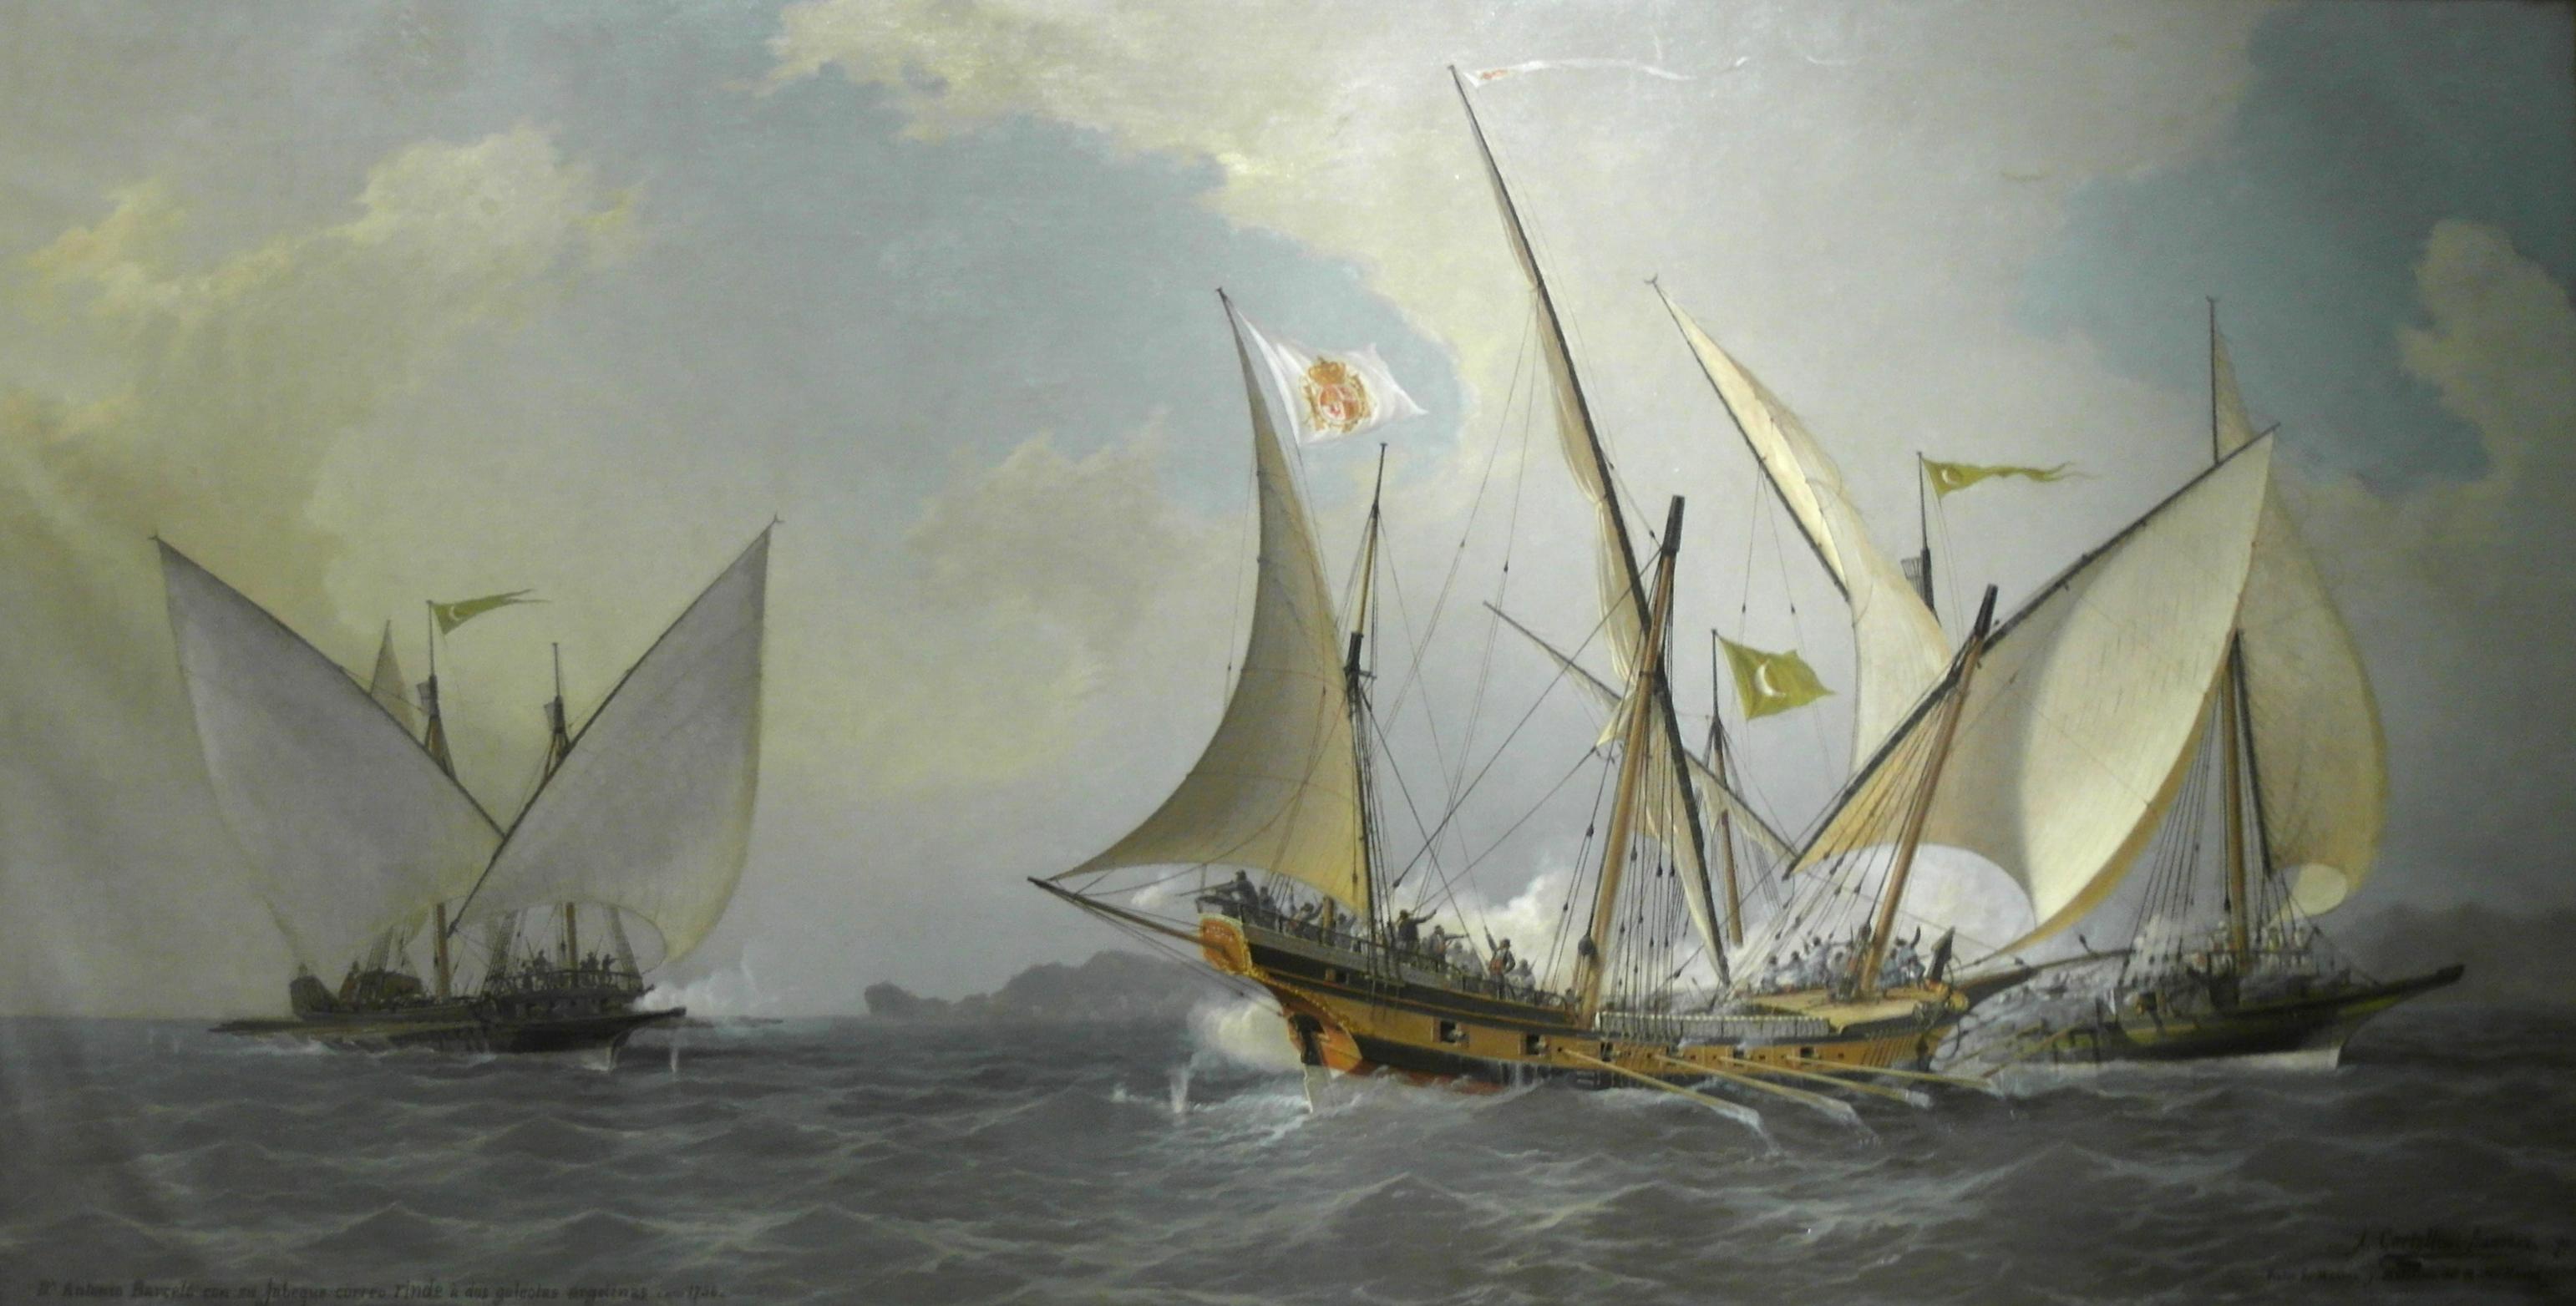 Piraten auf Mallorca